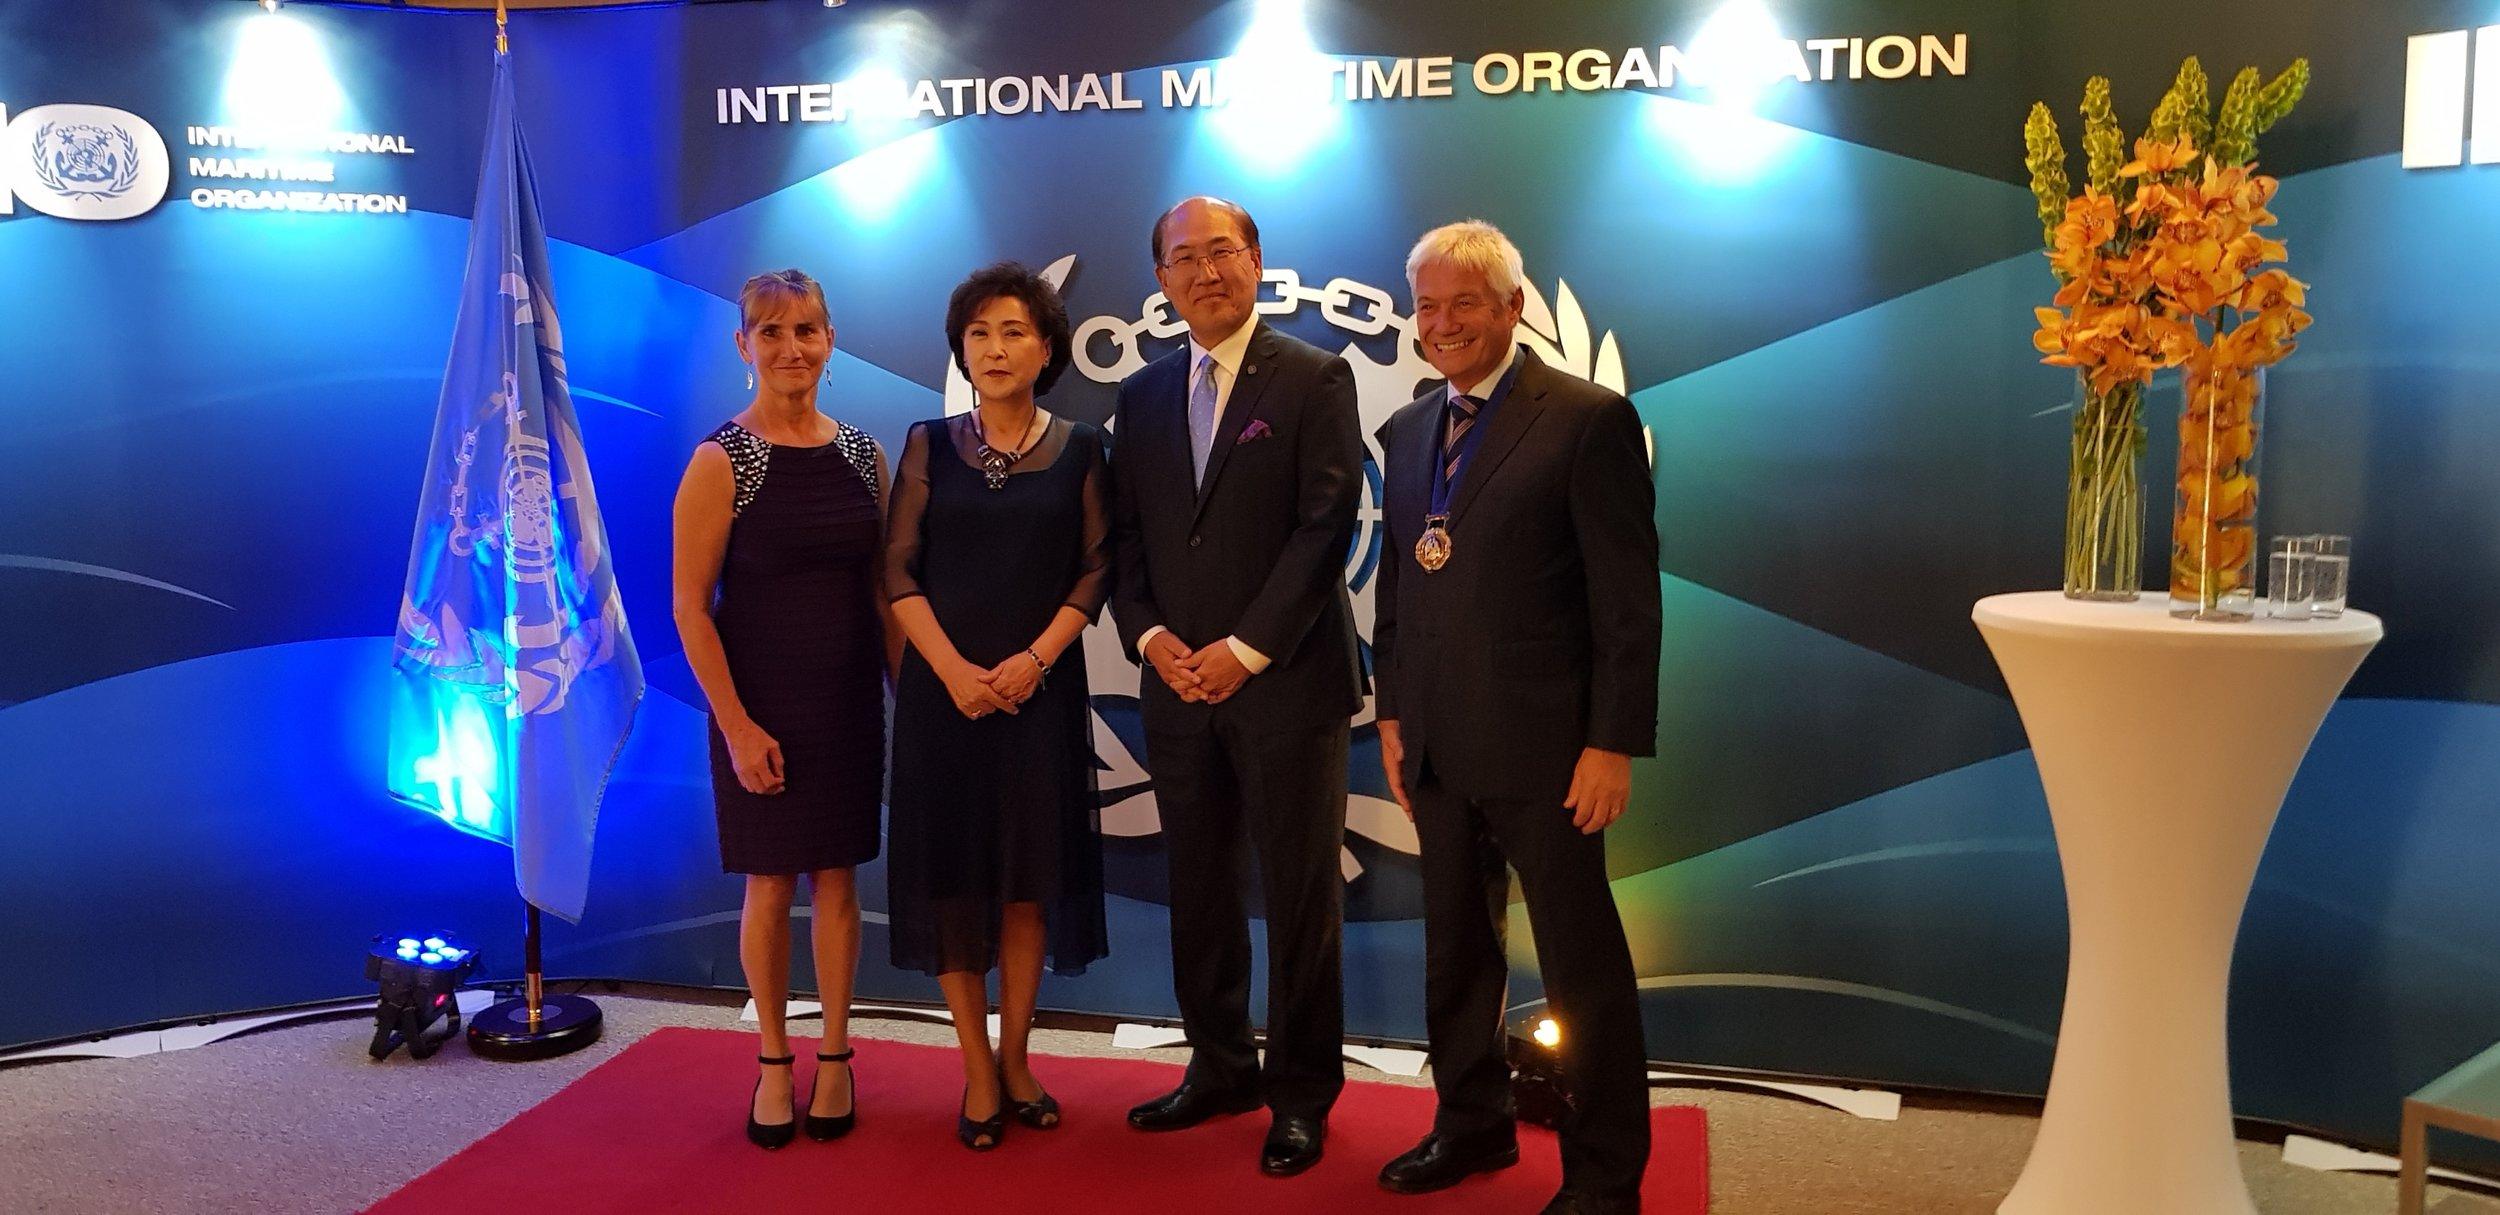 World Maritime Day celebrated at International Maritime Organisation Headquarters